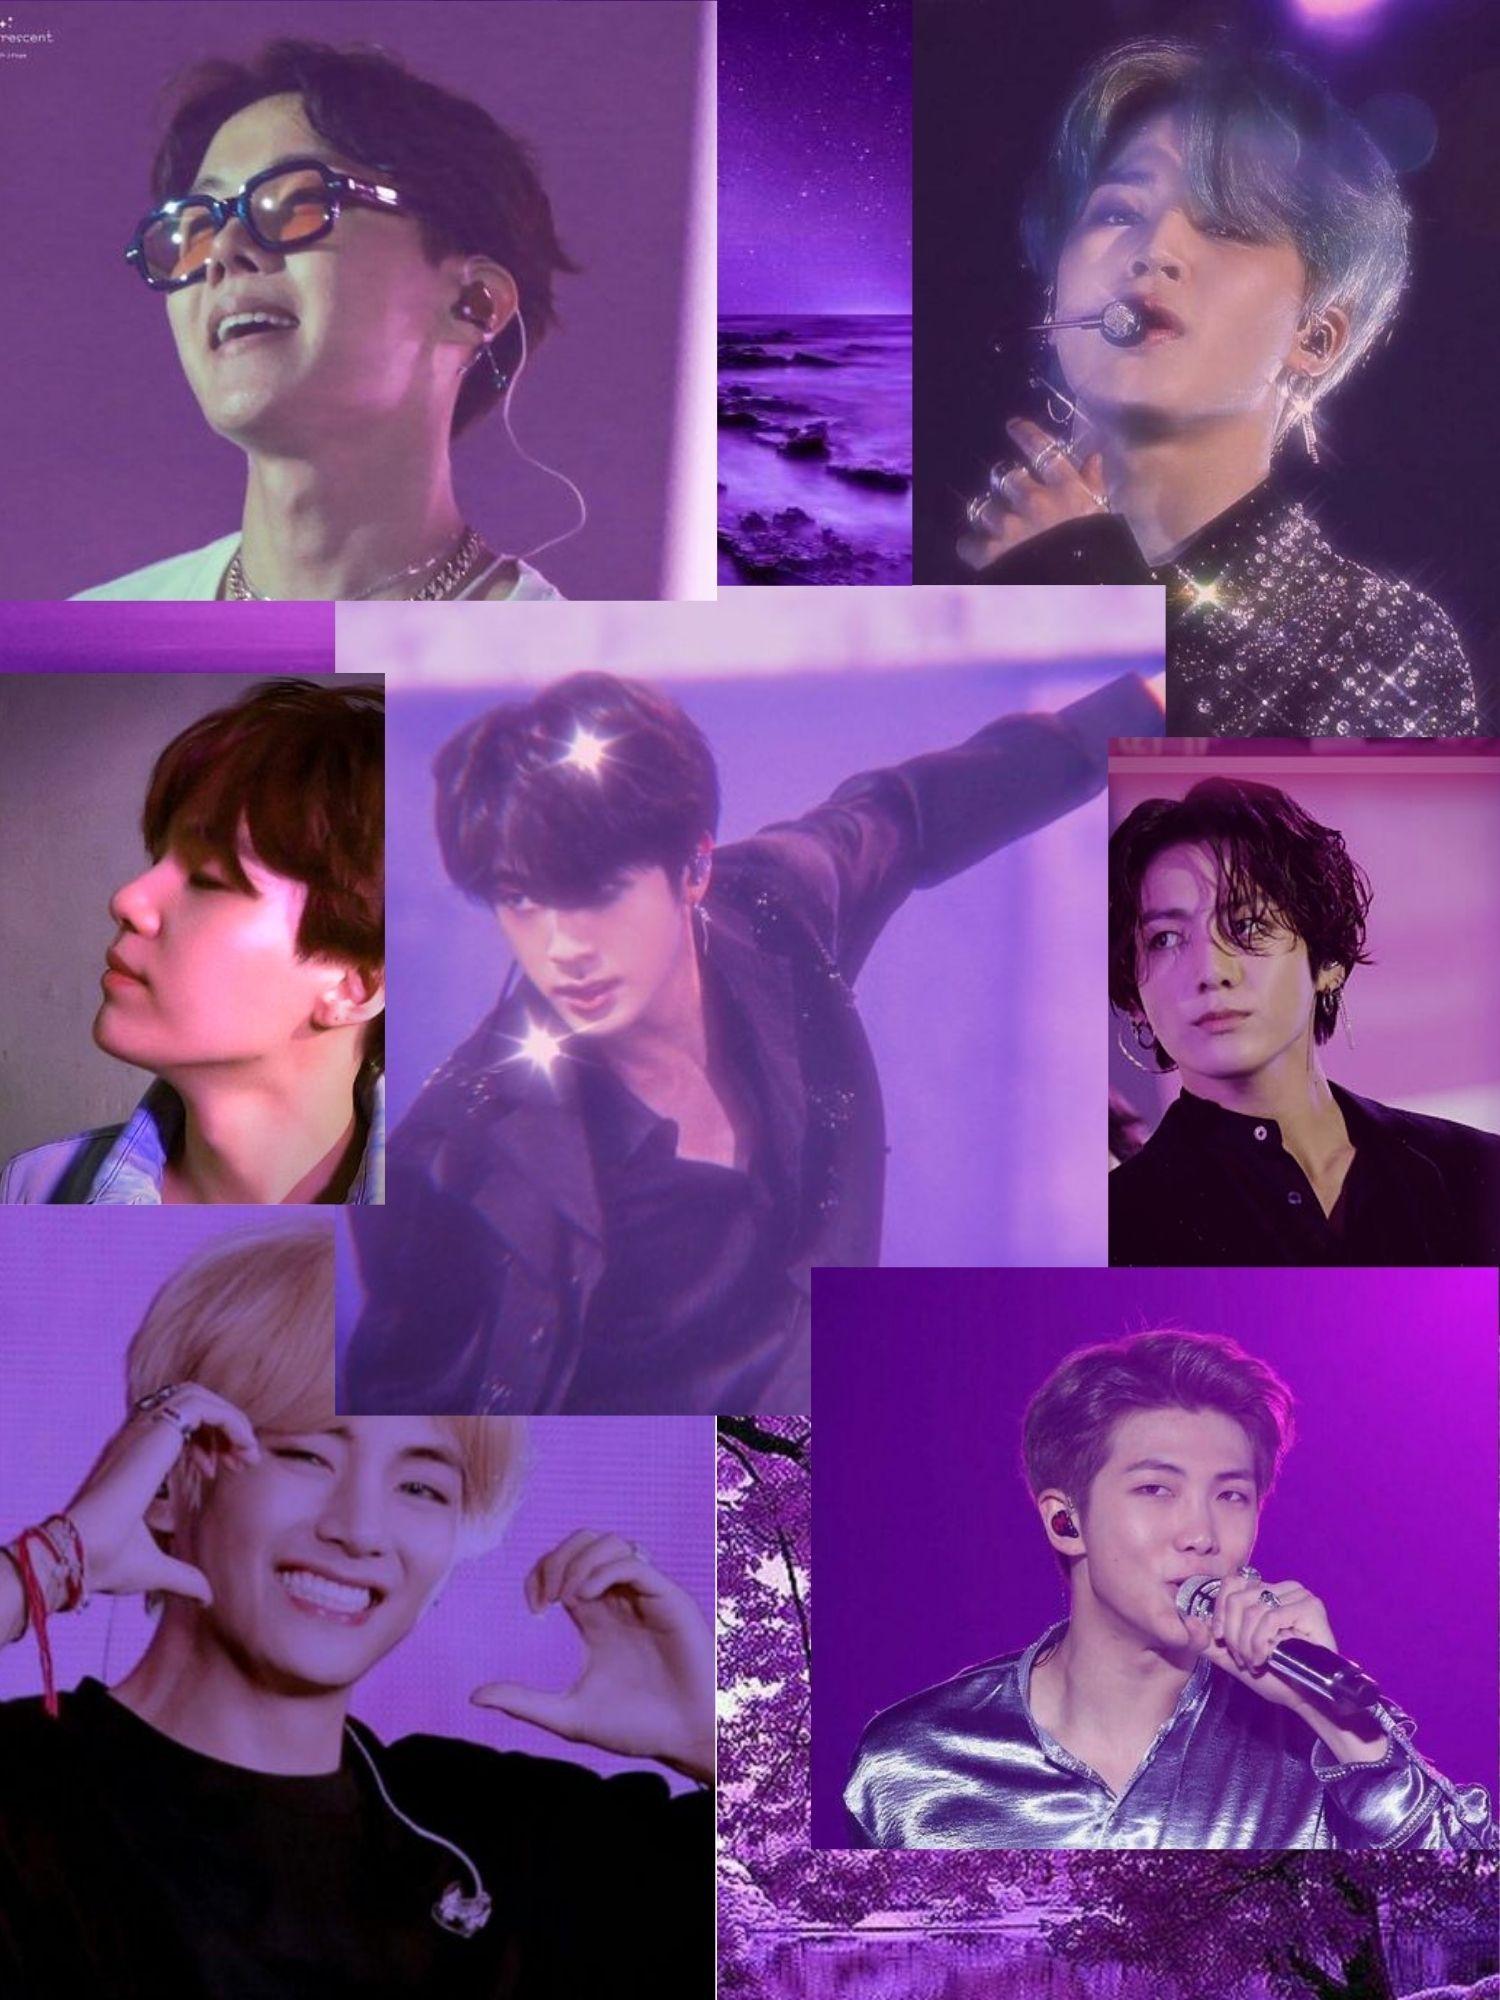 Bts Purple Wallpaper For Ipad Purple Wallpaper All Bts Members Bts Wallpaper Bts wallpaper 2021 ipad